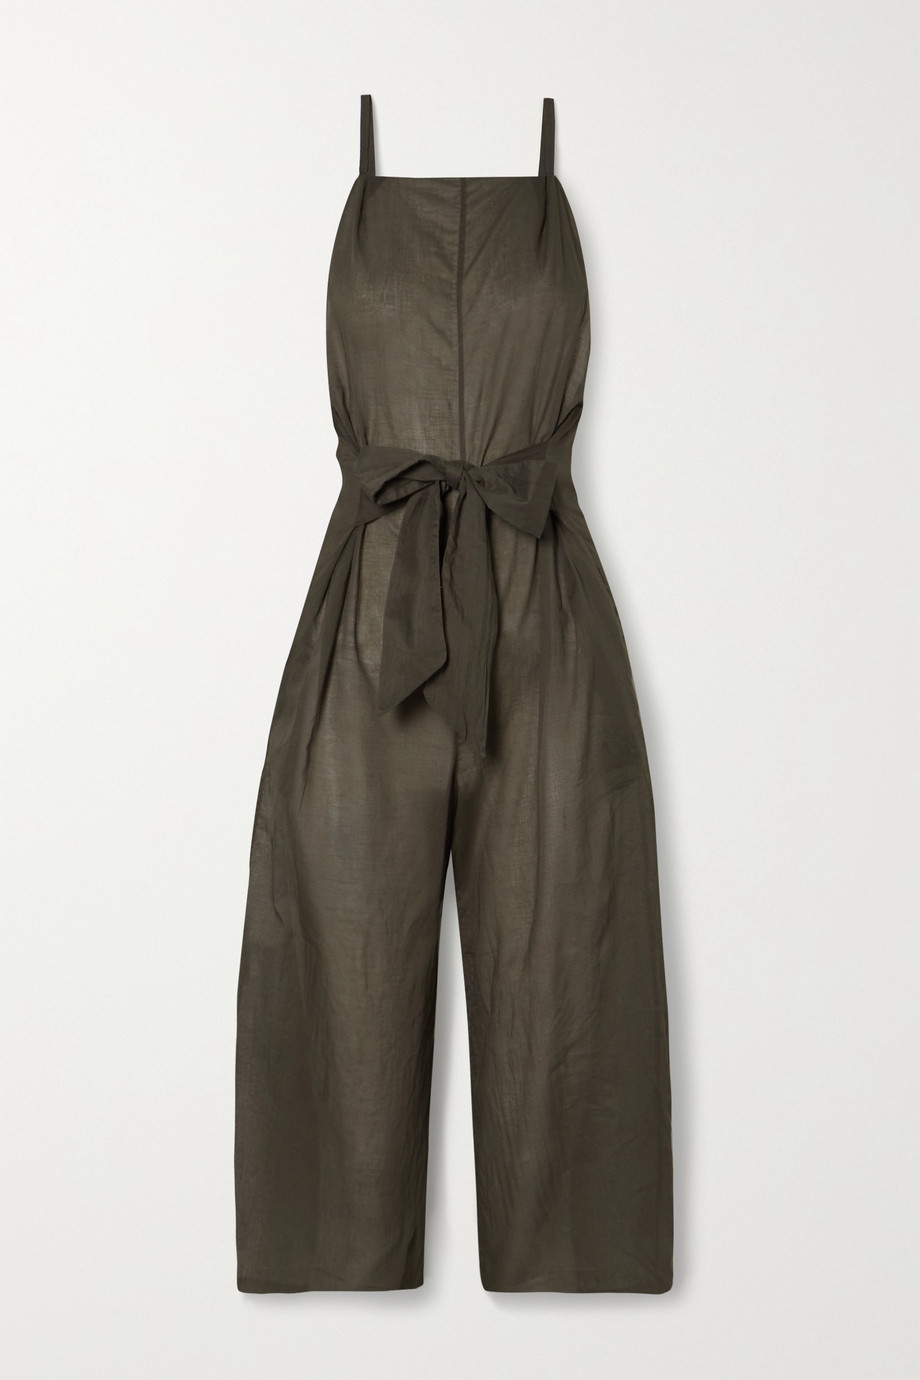 Skin Brisa 正面系带式纯棉巴里纱连身裤